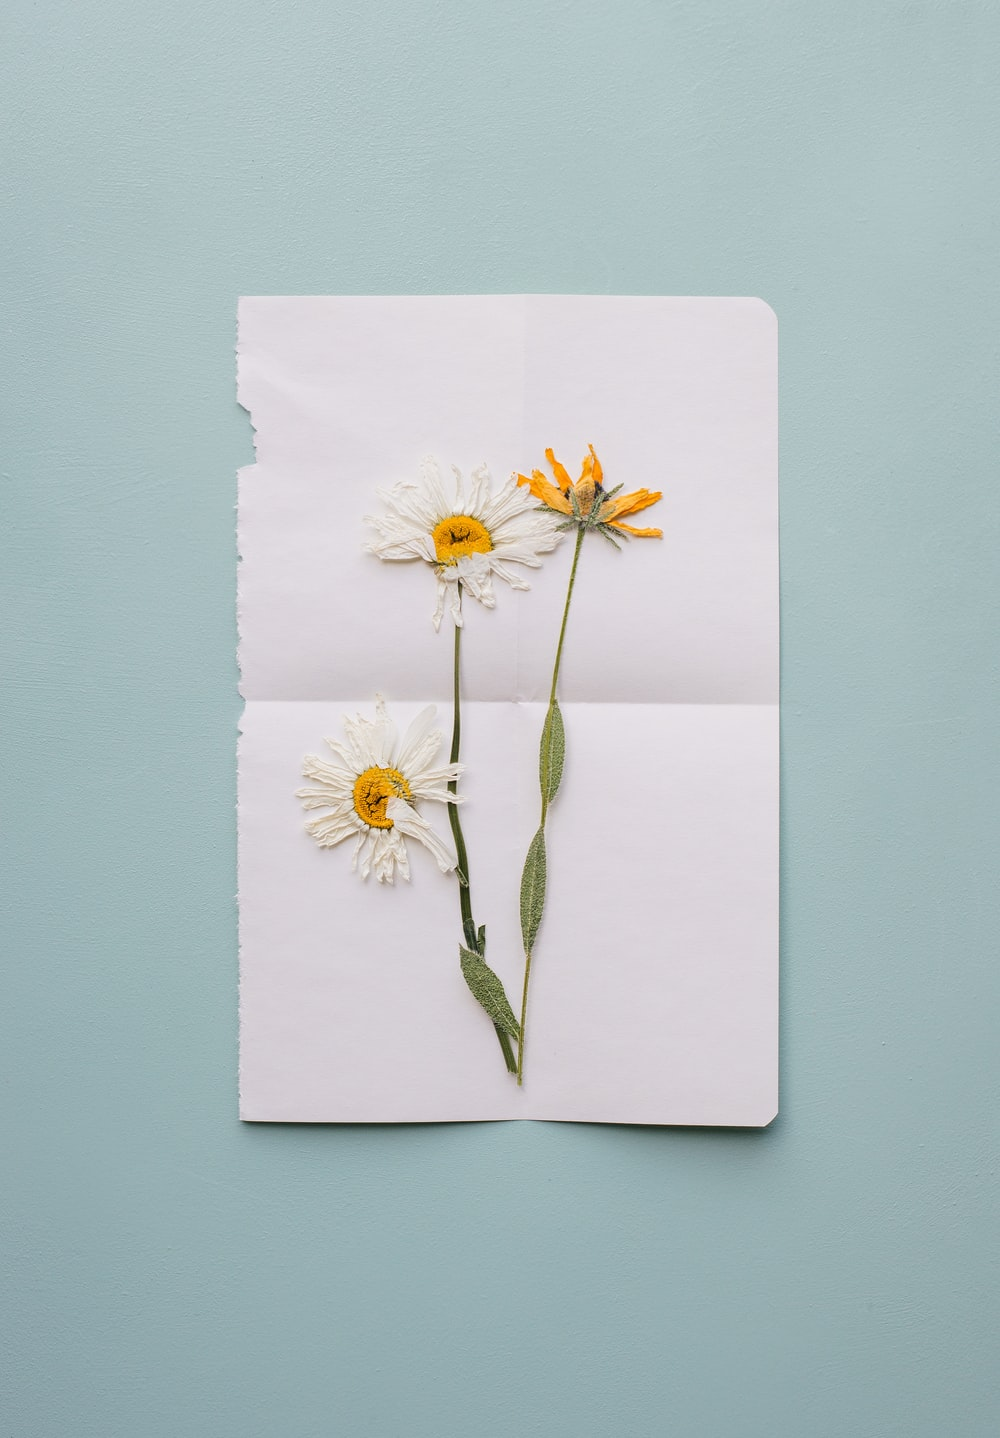 white and yellow daisy flowers handmade card